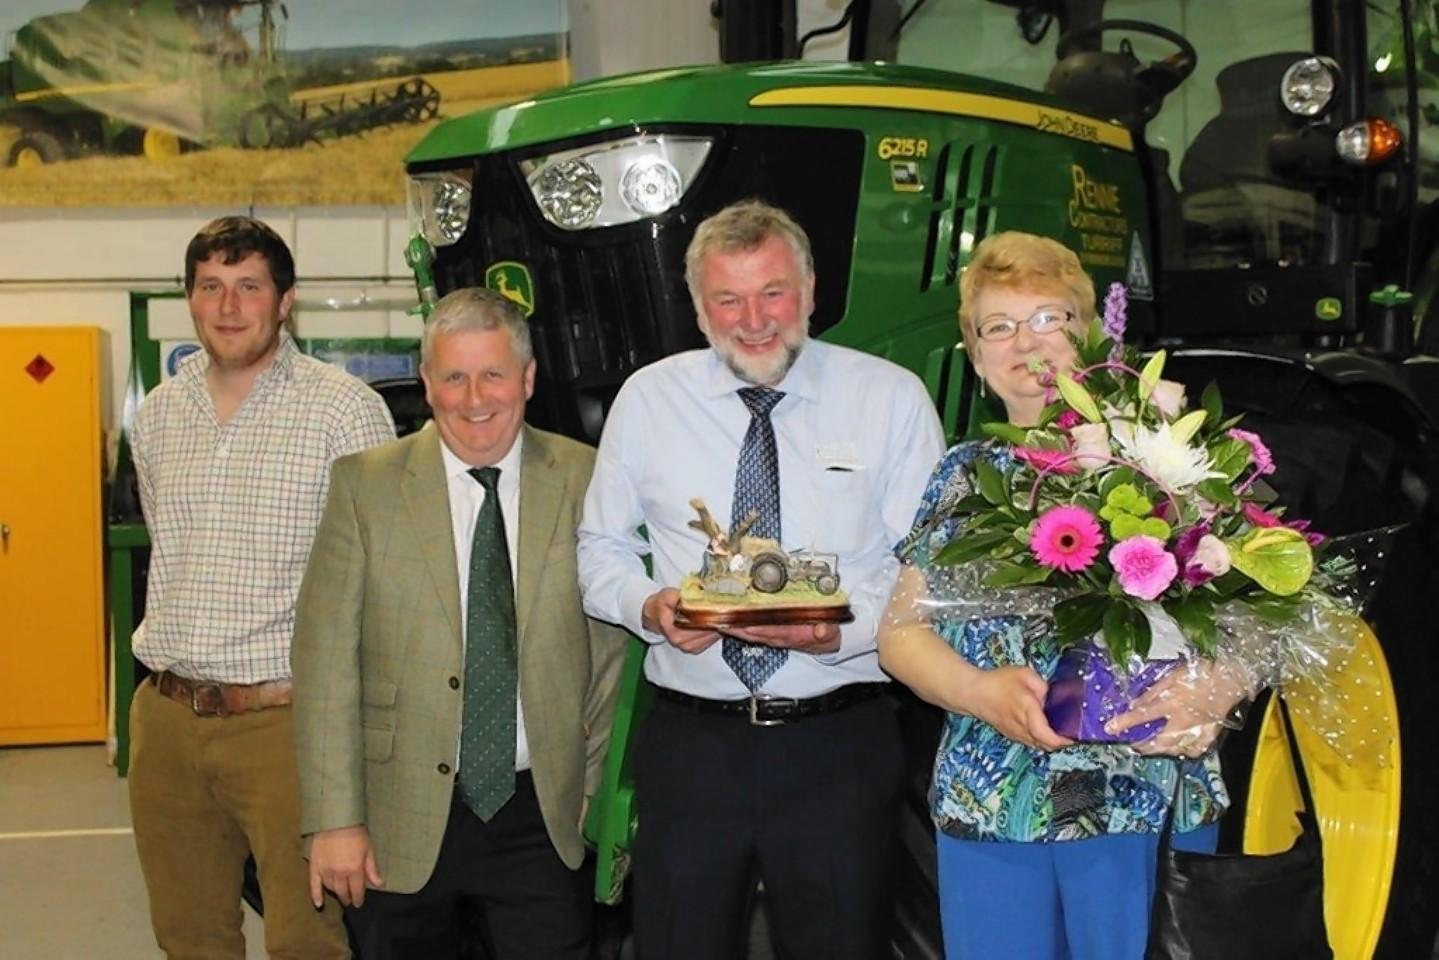 Stuart Barclay, Neil Barclay, Neil Webster and Linda Webster.